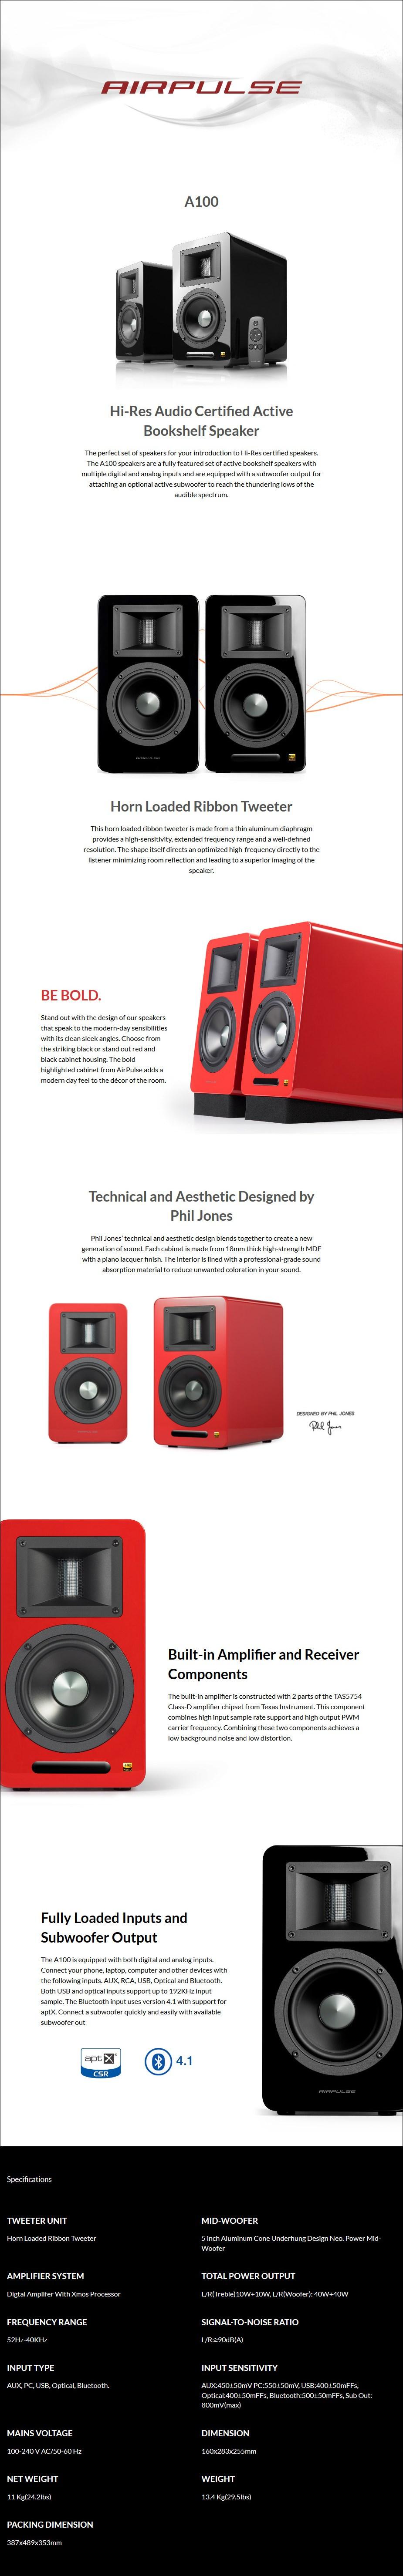 Edifier Airpulse A100 Hi-Res Active Bookshelf Speaker - Black - Overview 1